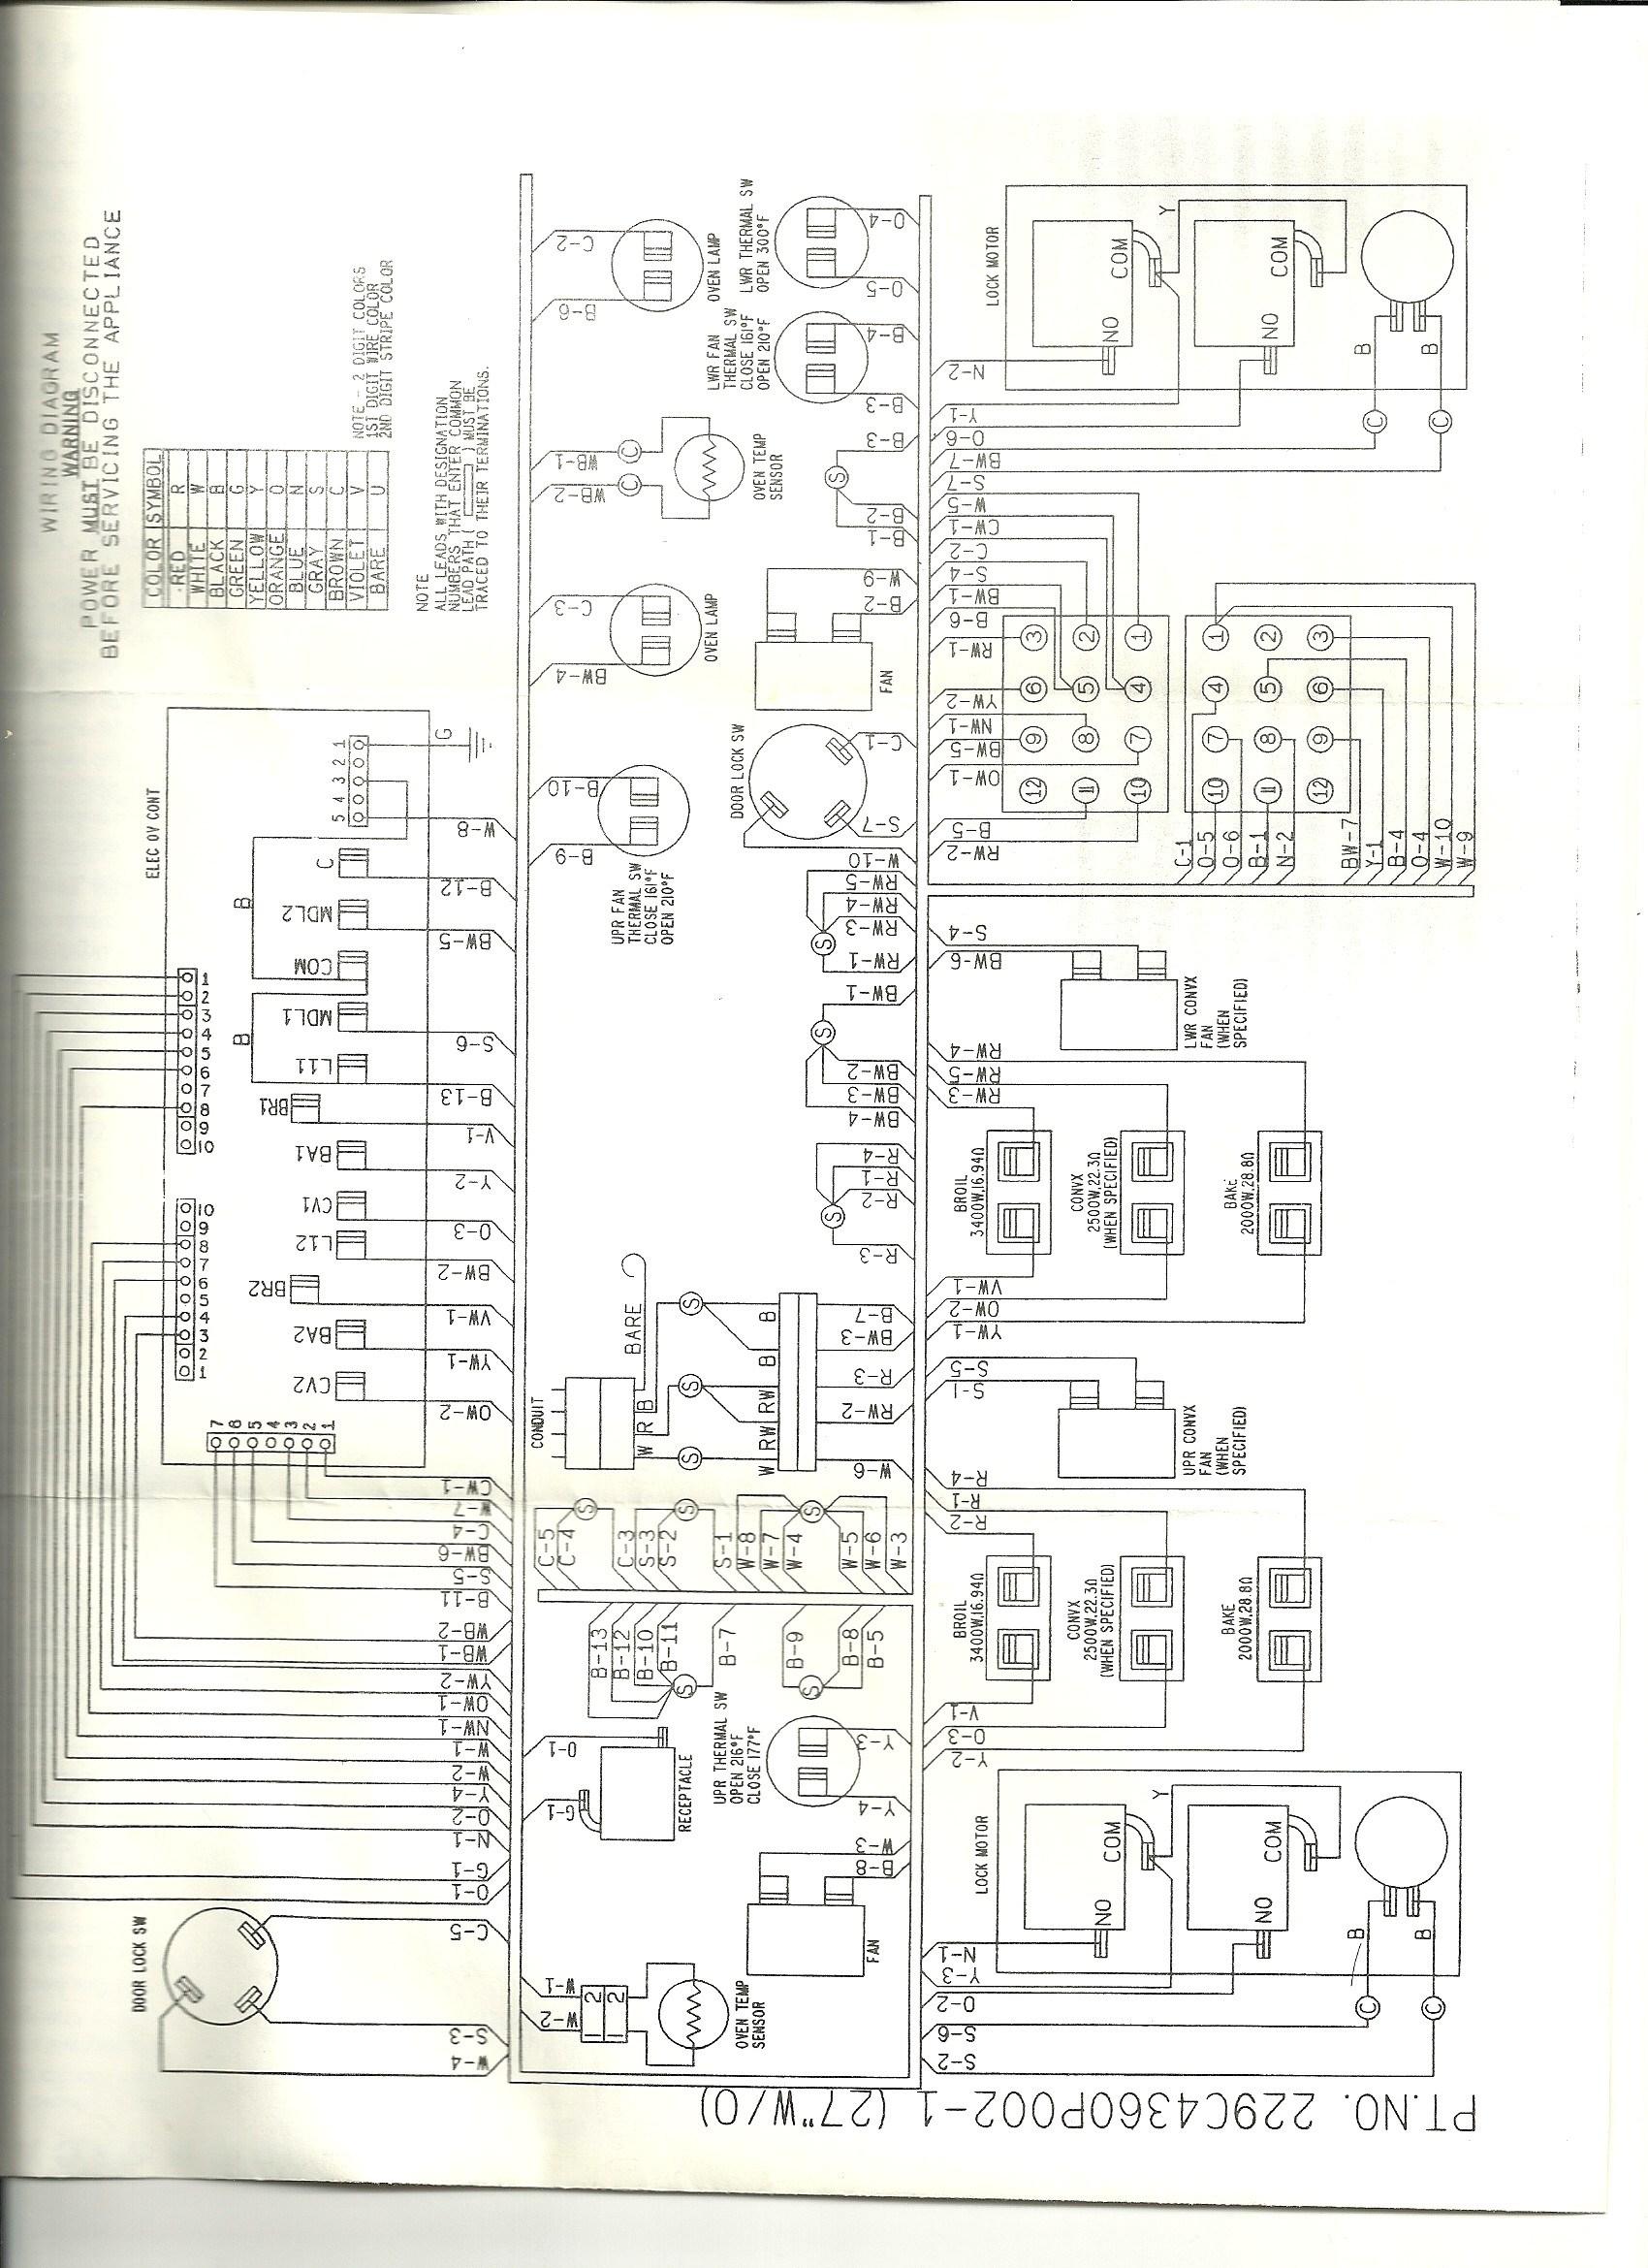 Ge Gas Range Wiring Diagram - Wiring Diagrams Pause Ge Dbxr Eg Ww Wiring Diagrams For Dryers on